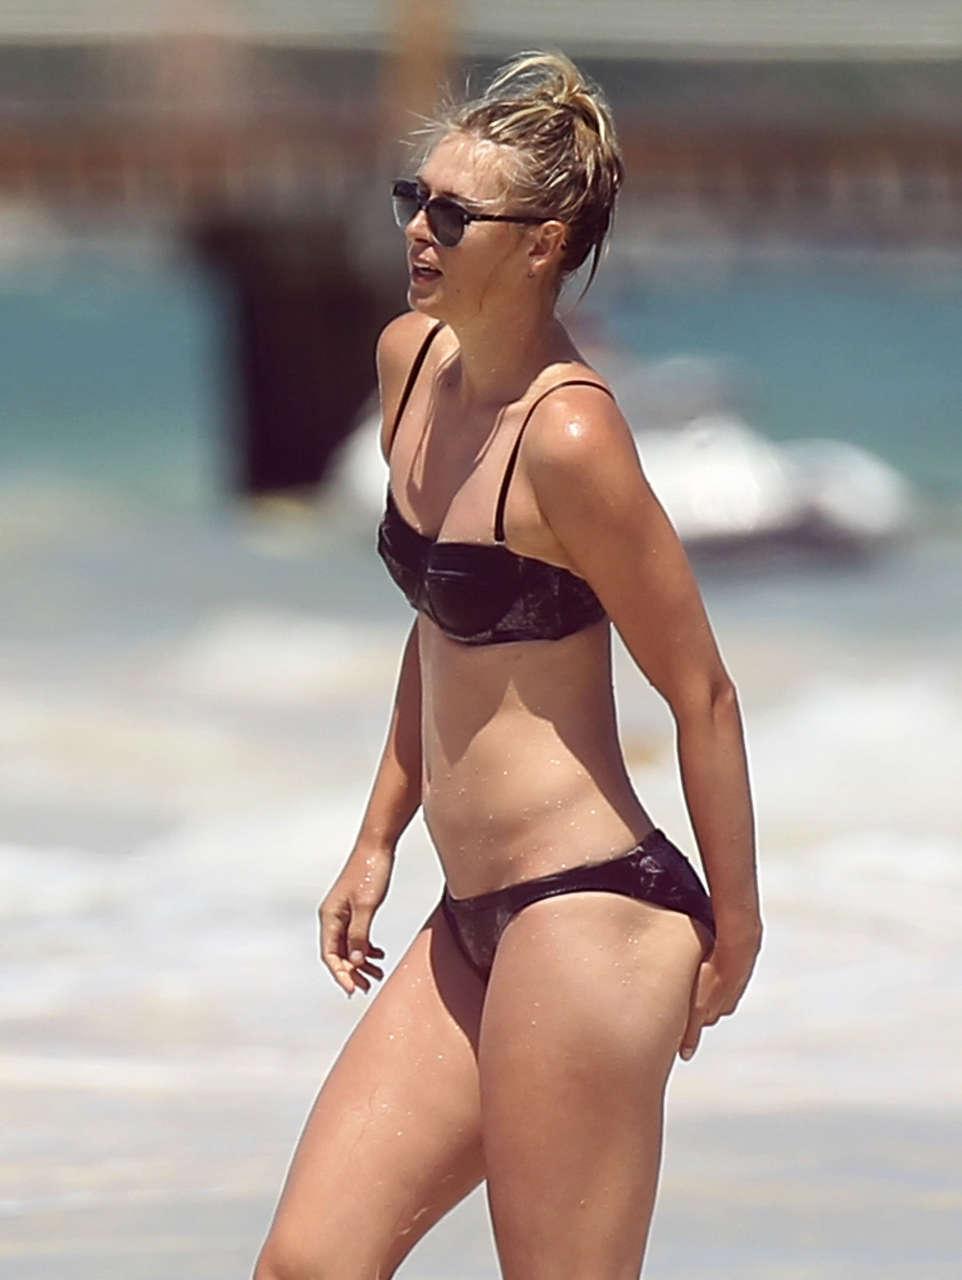 Maria Sharapova Wearing A Bikini NSFW